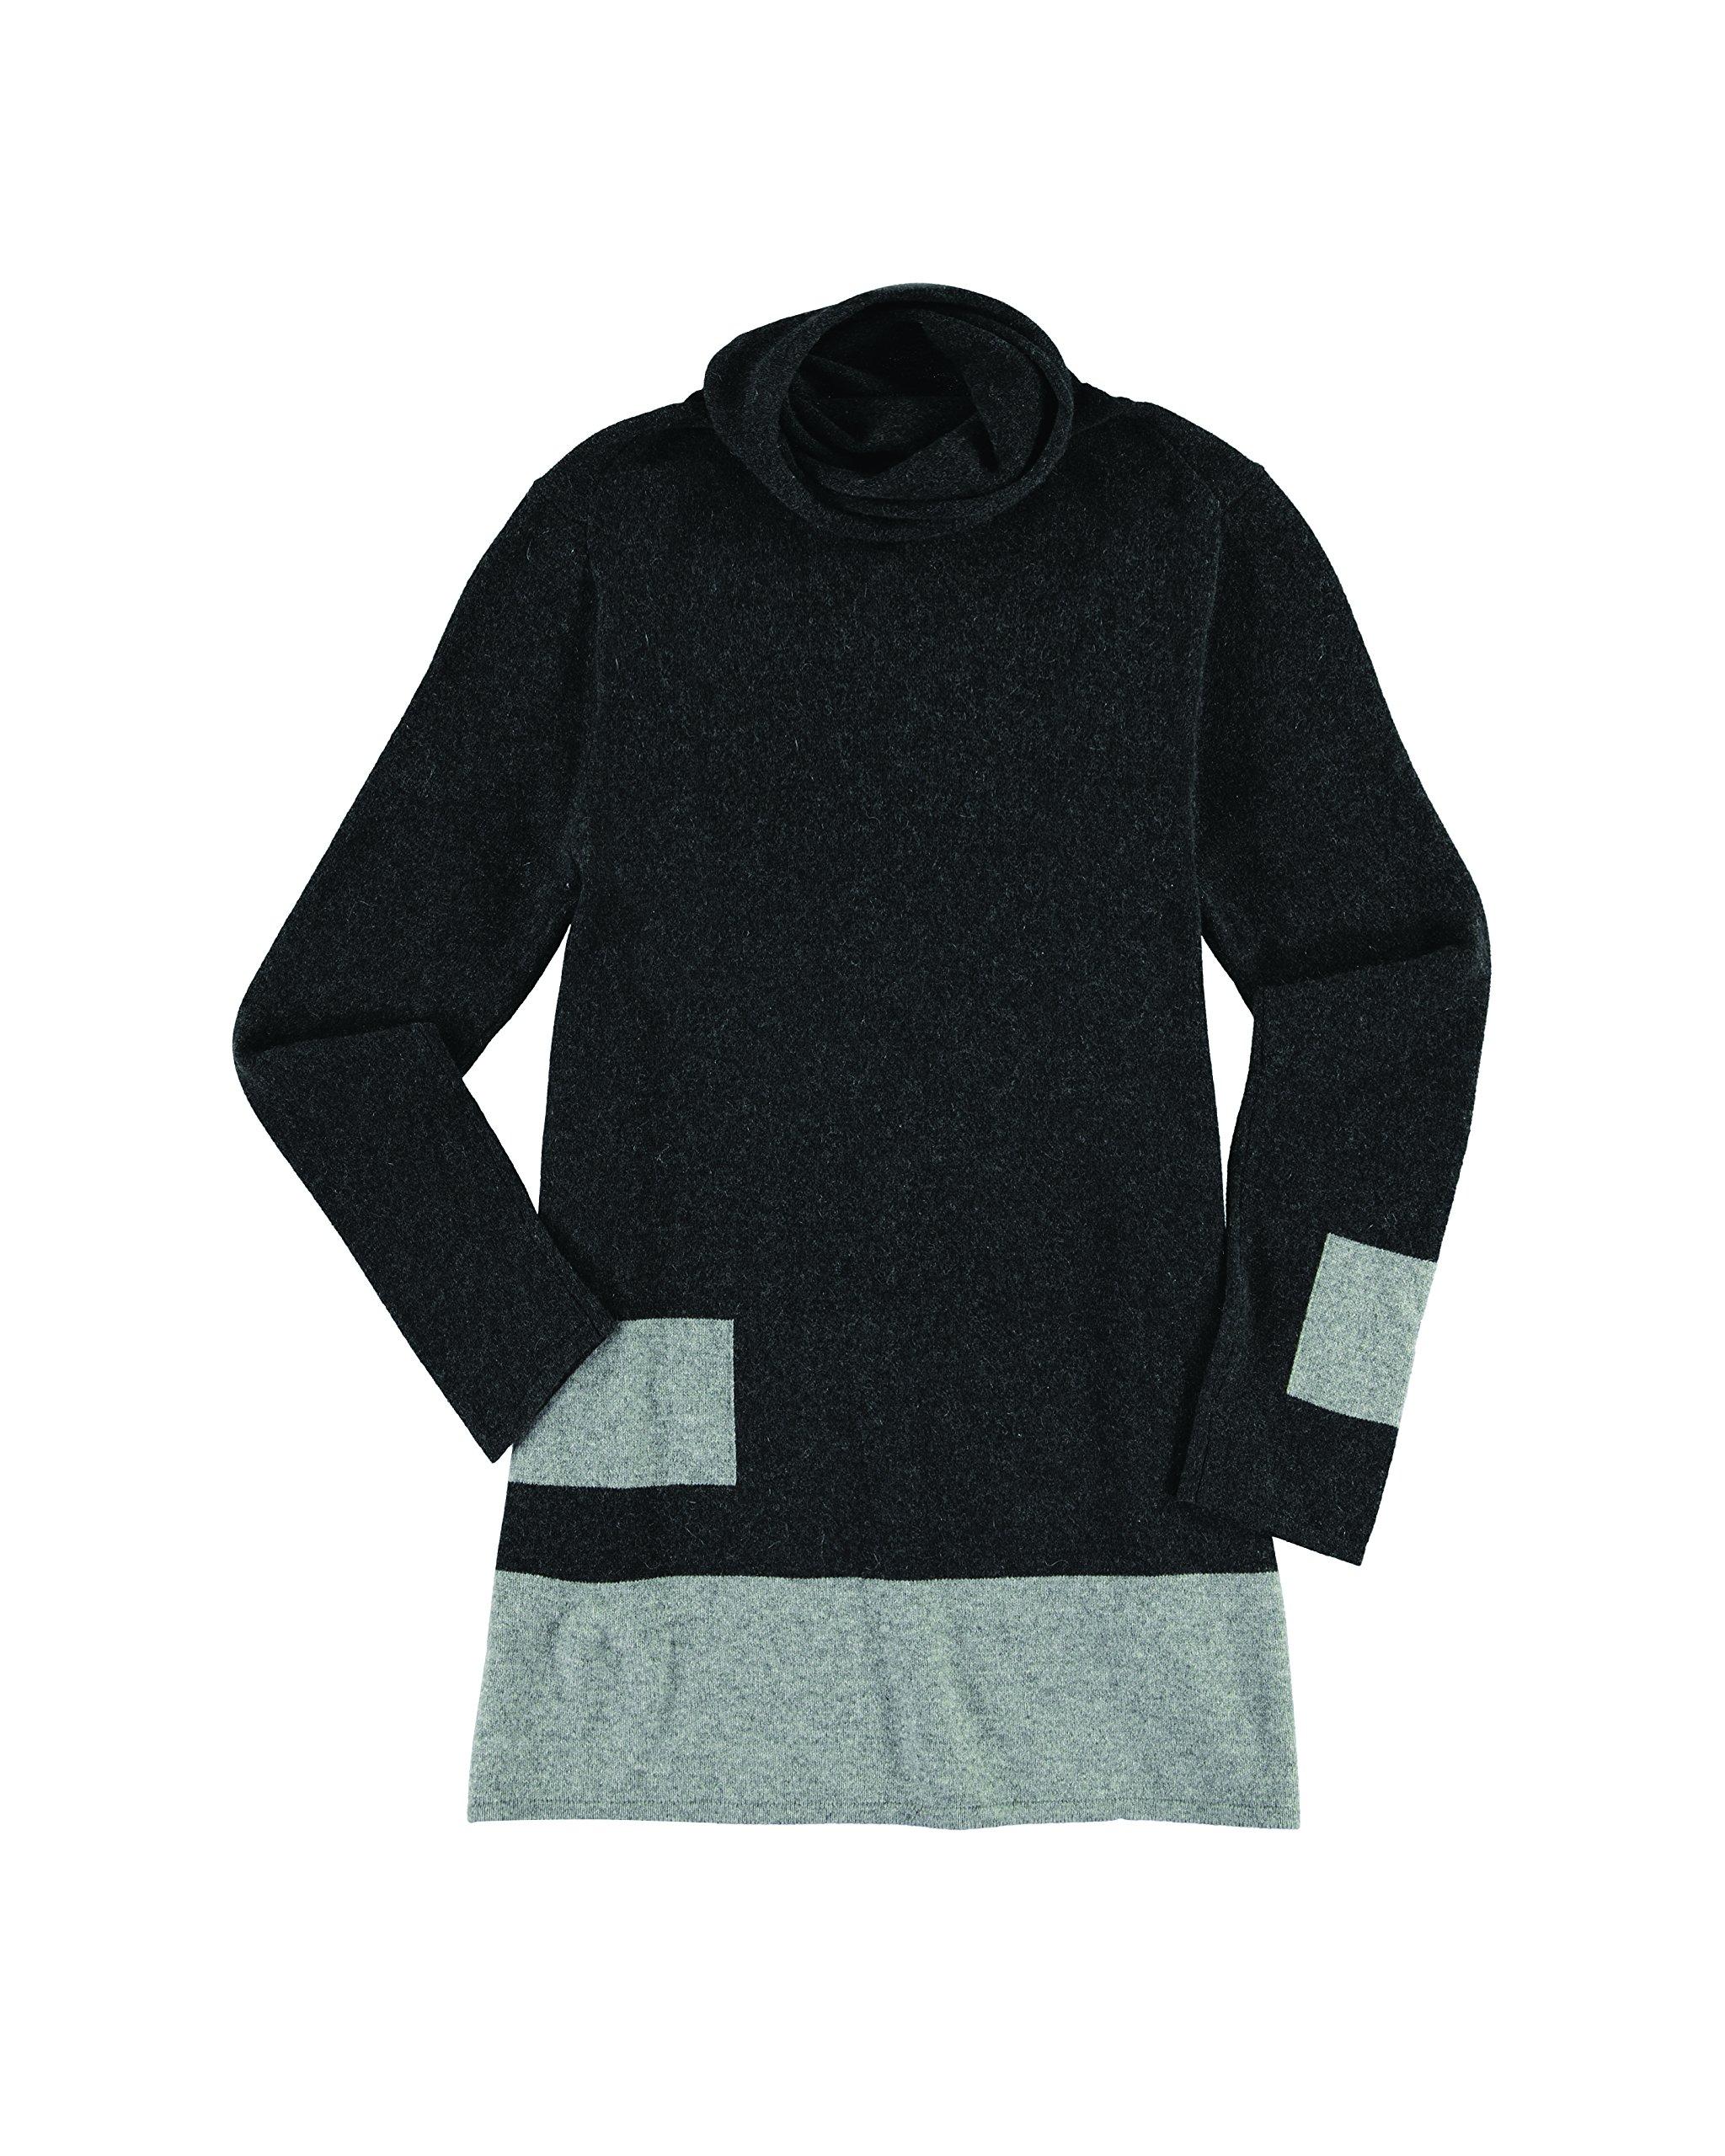 Krimson Klover Stacks Cashmere Tunic - ( Charcoal, Large )